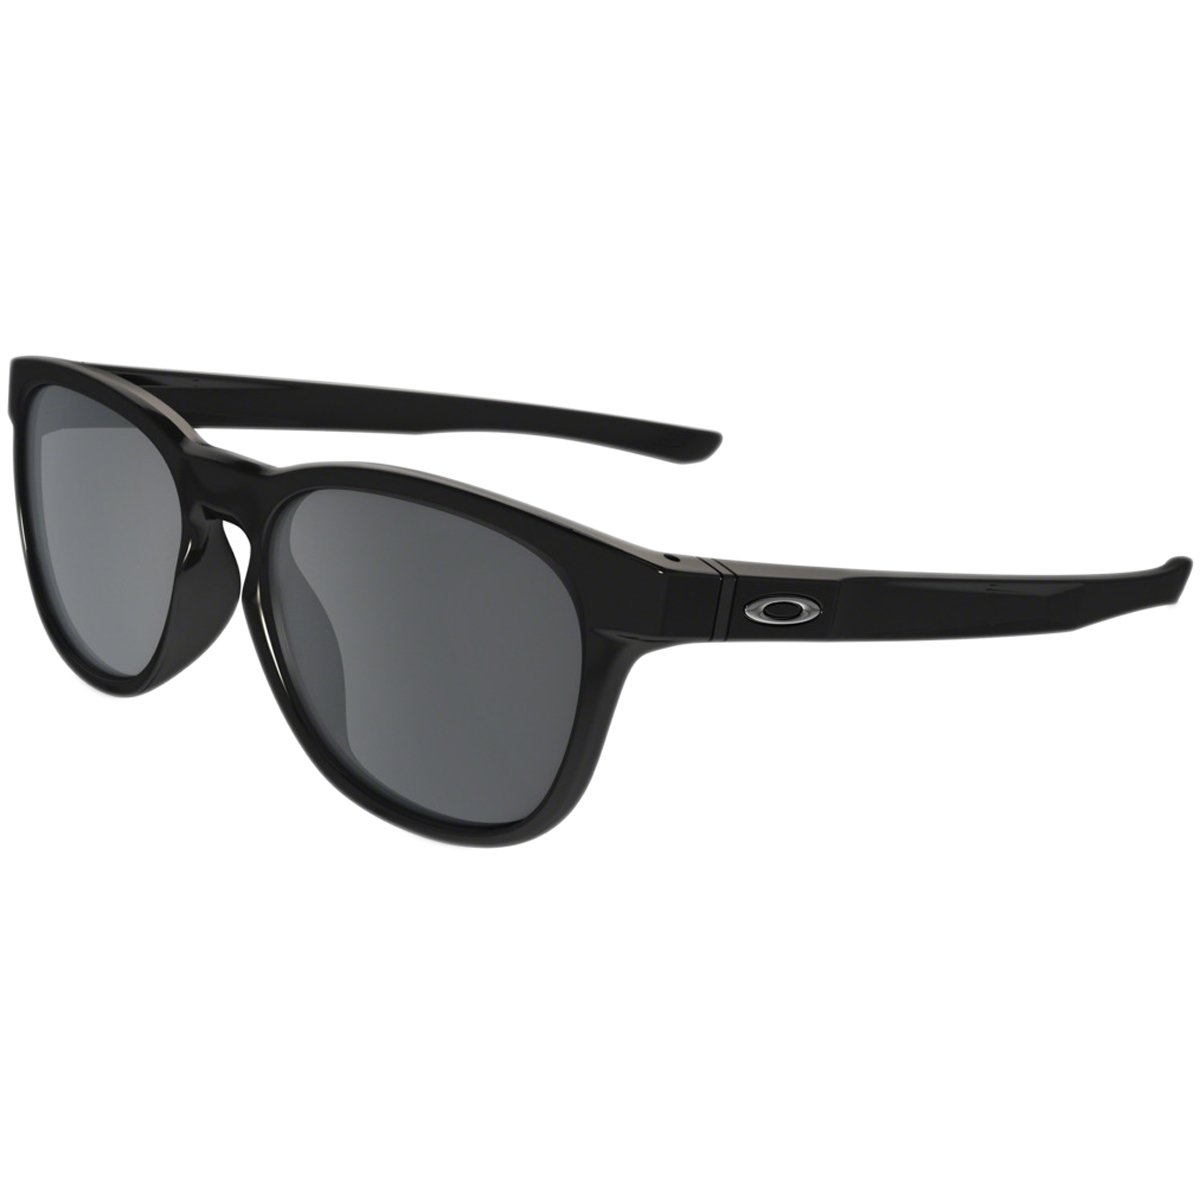 Oakley Stringer Sunglasses, Polished Black/Black Iridium